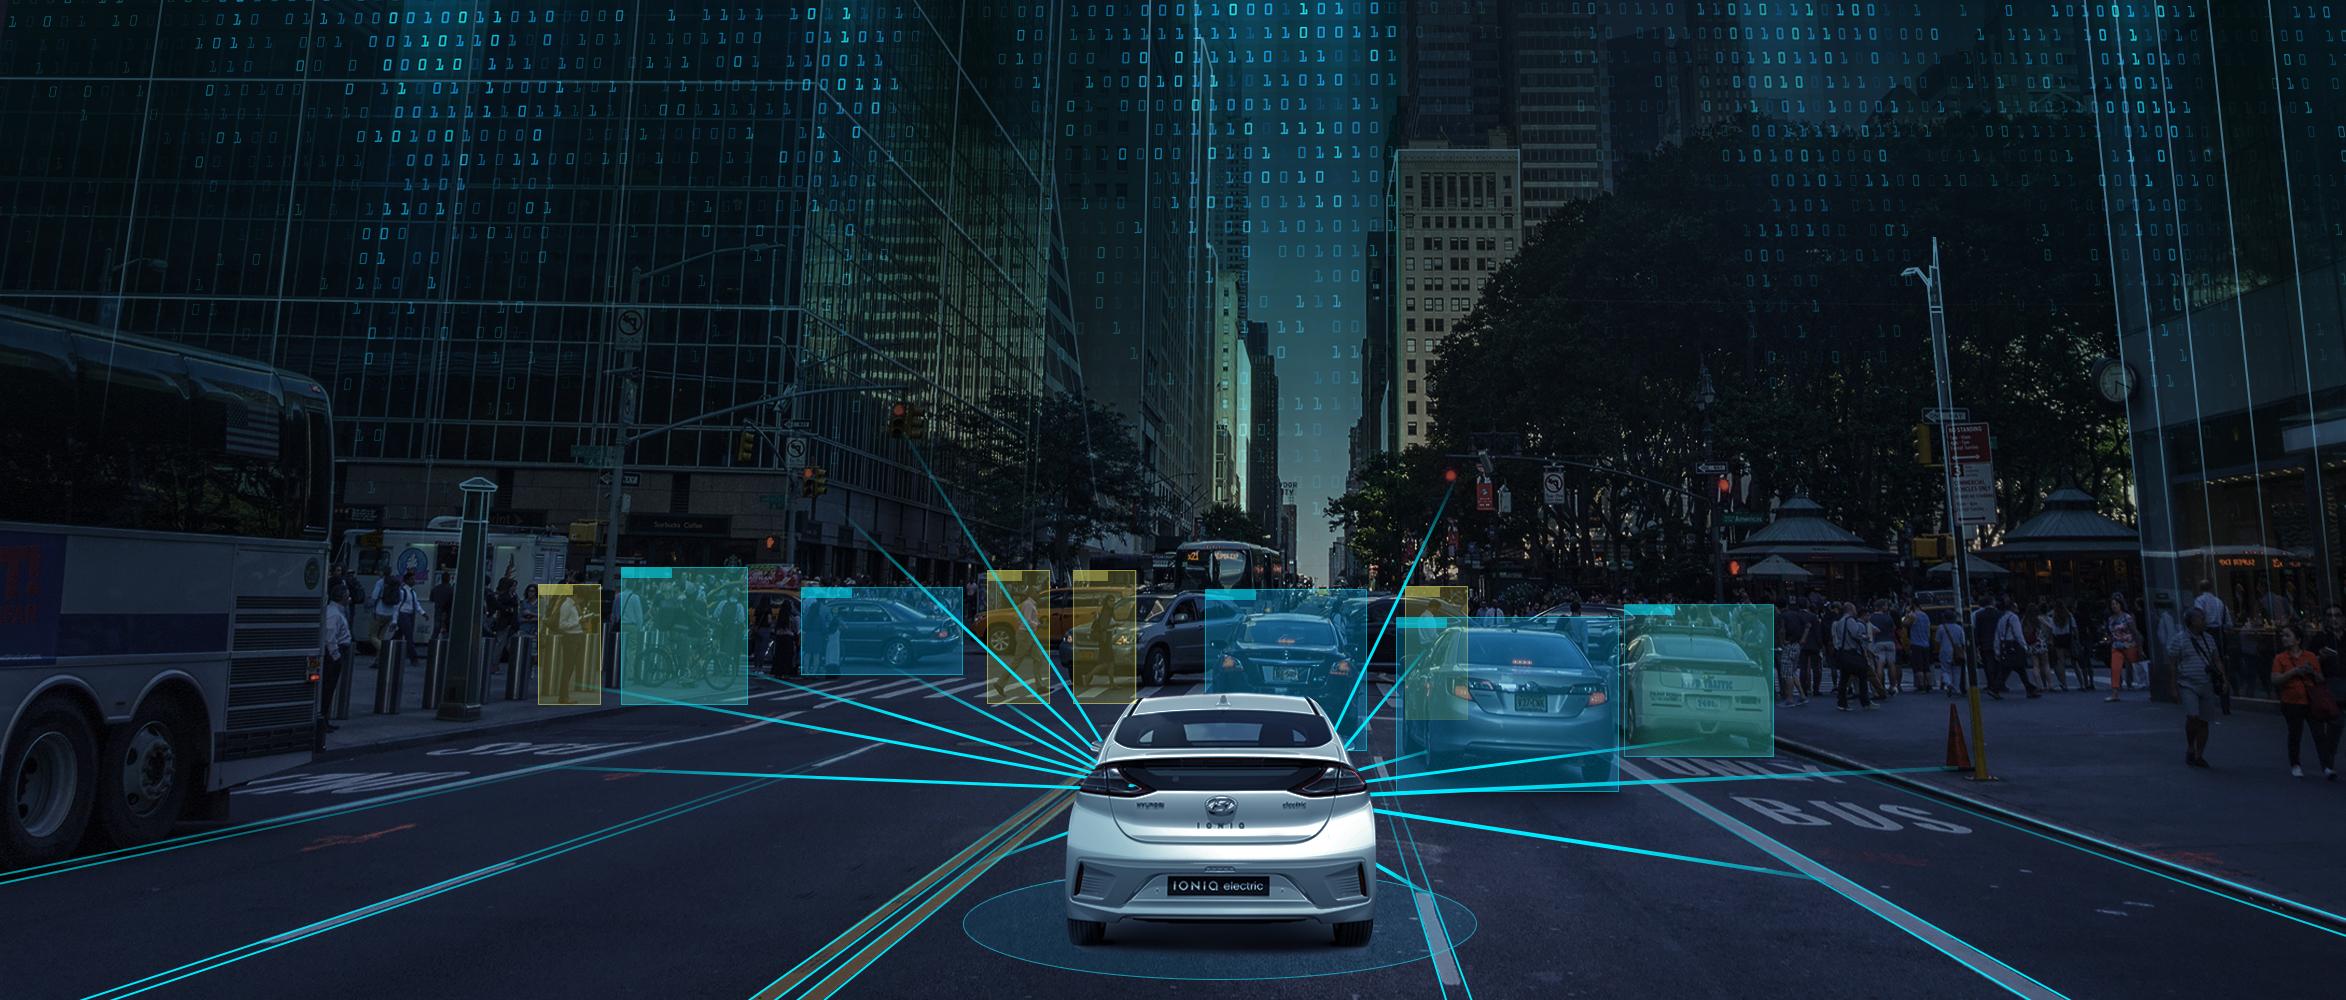 Smart radar startup MetaWave raises $10 million from Hyundai, Toyota